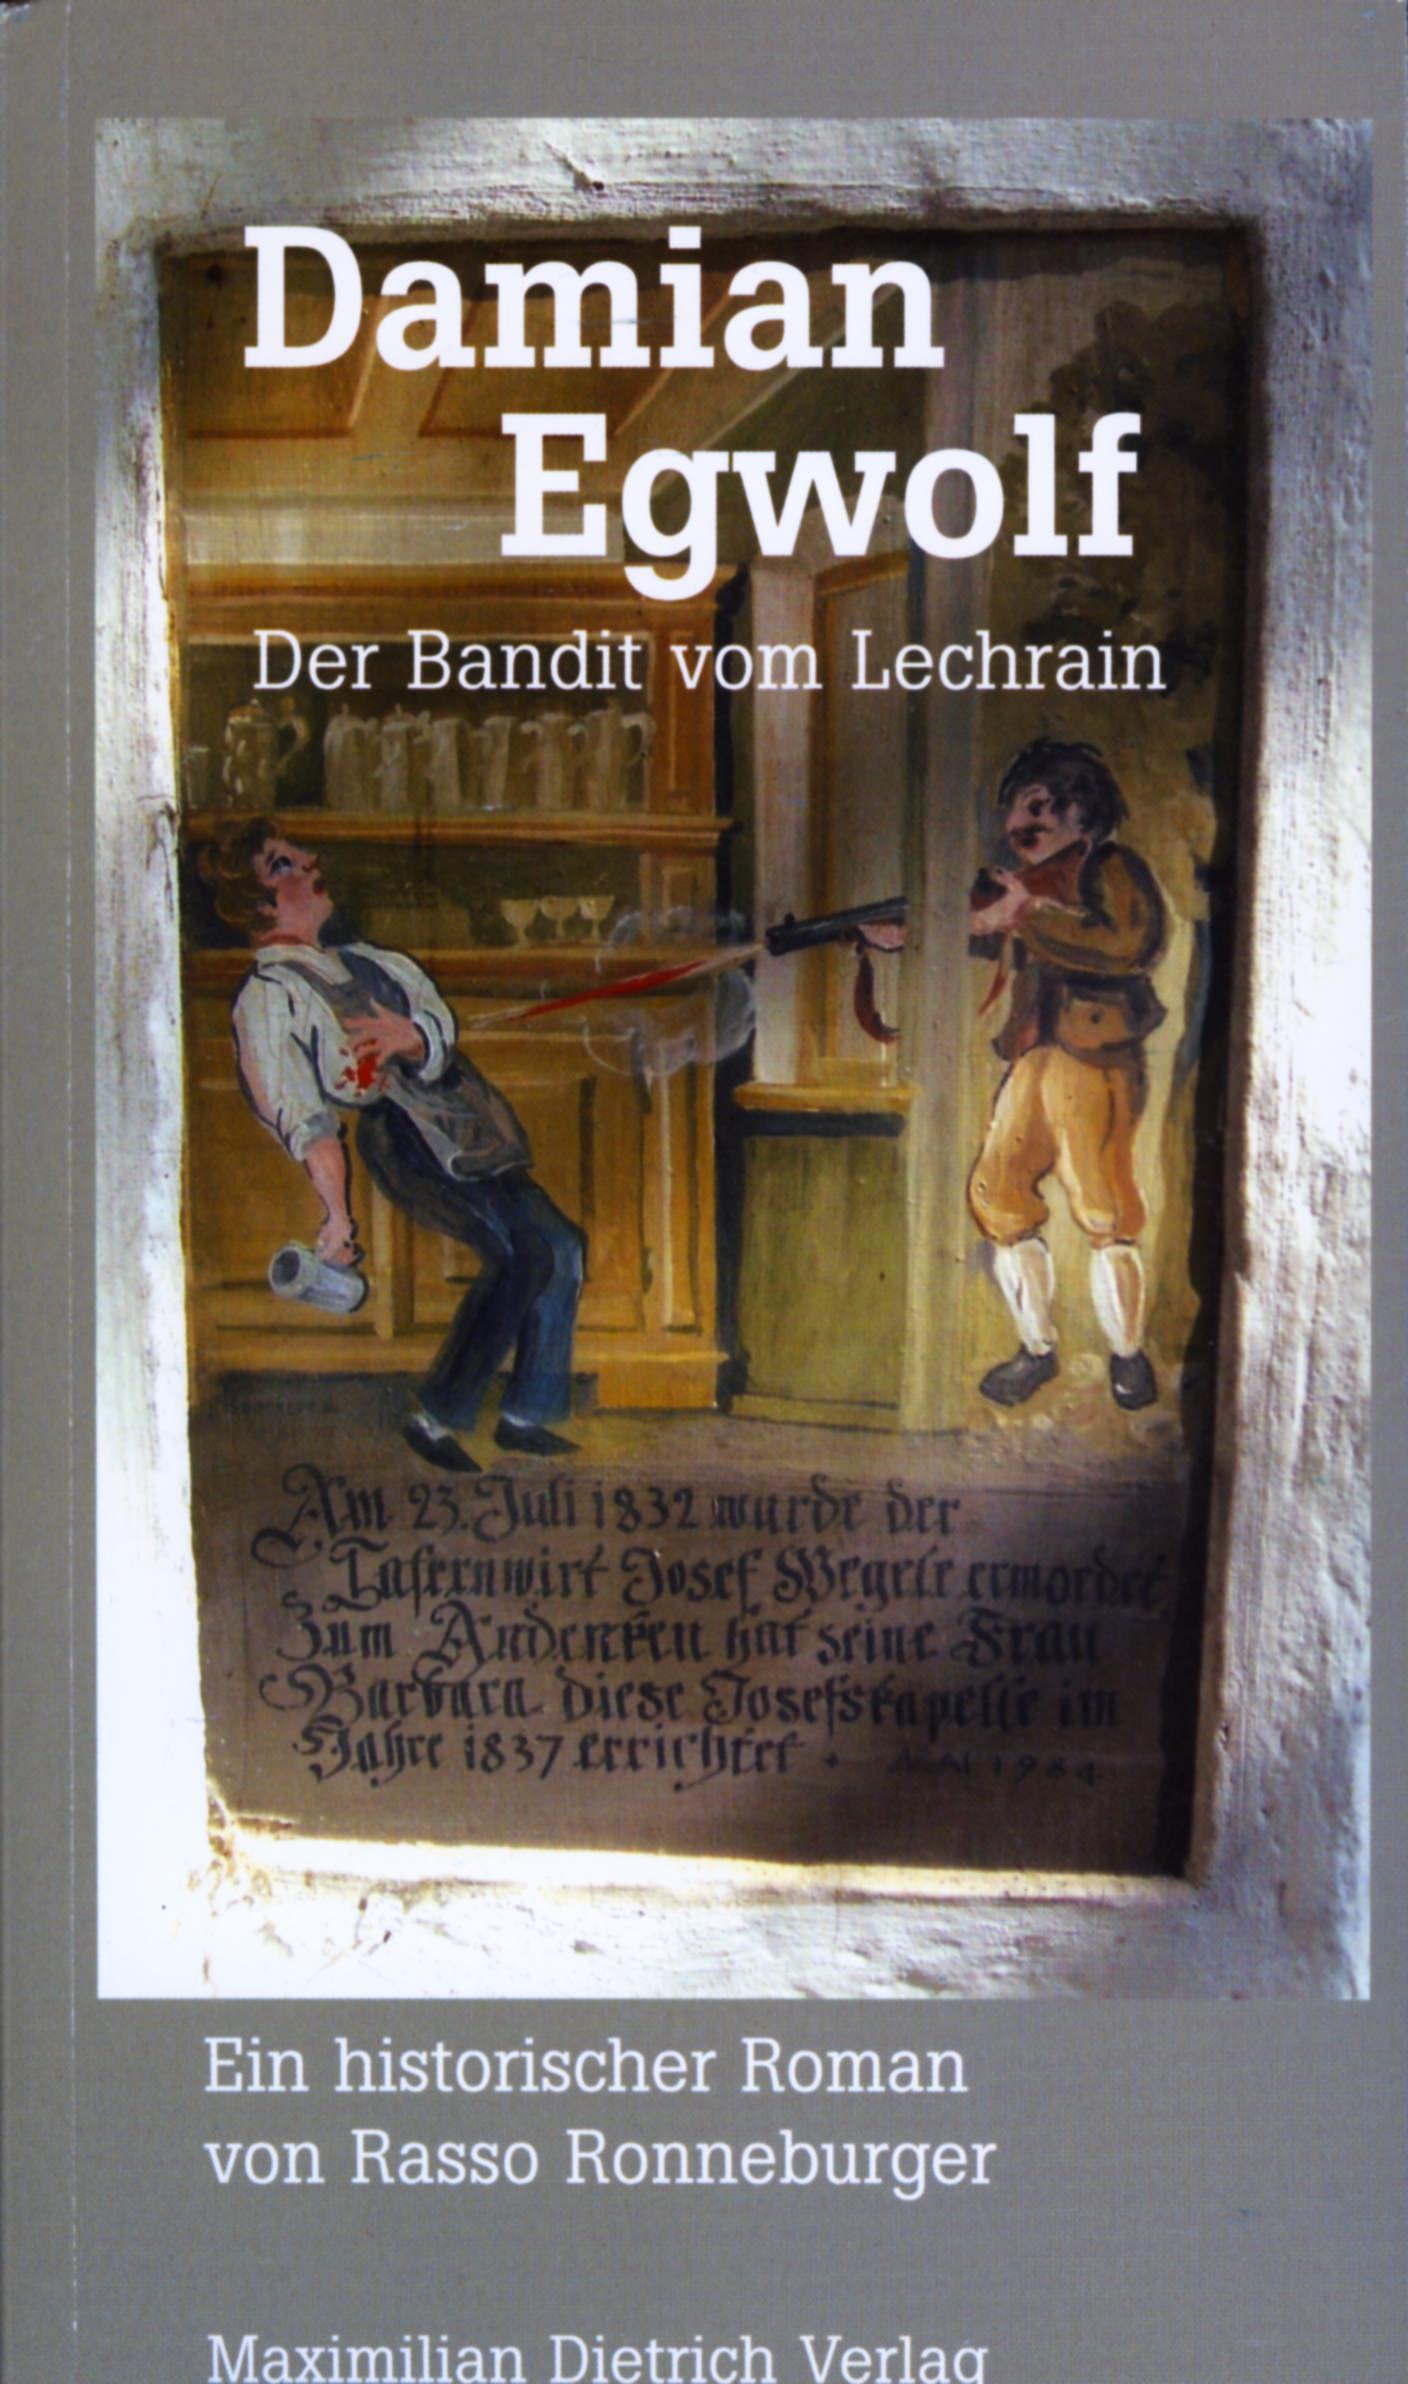 Ronneburger Rasso - Egwolf Damian